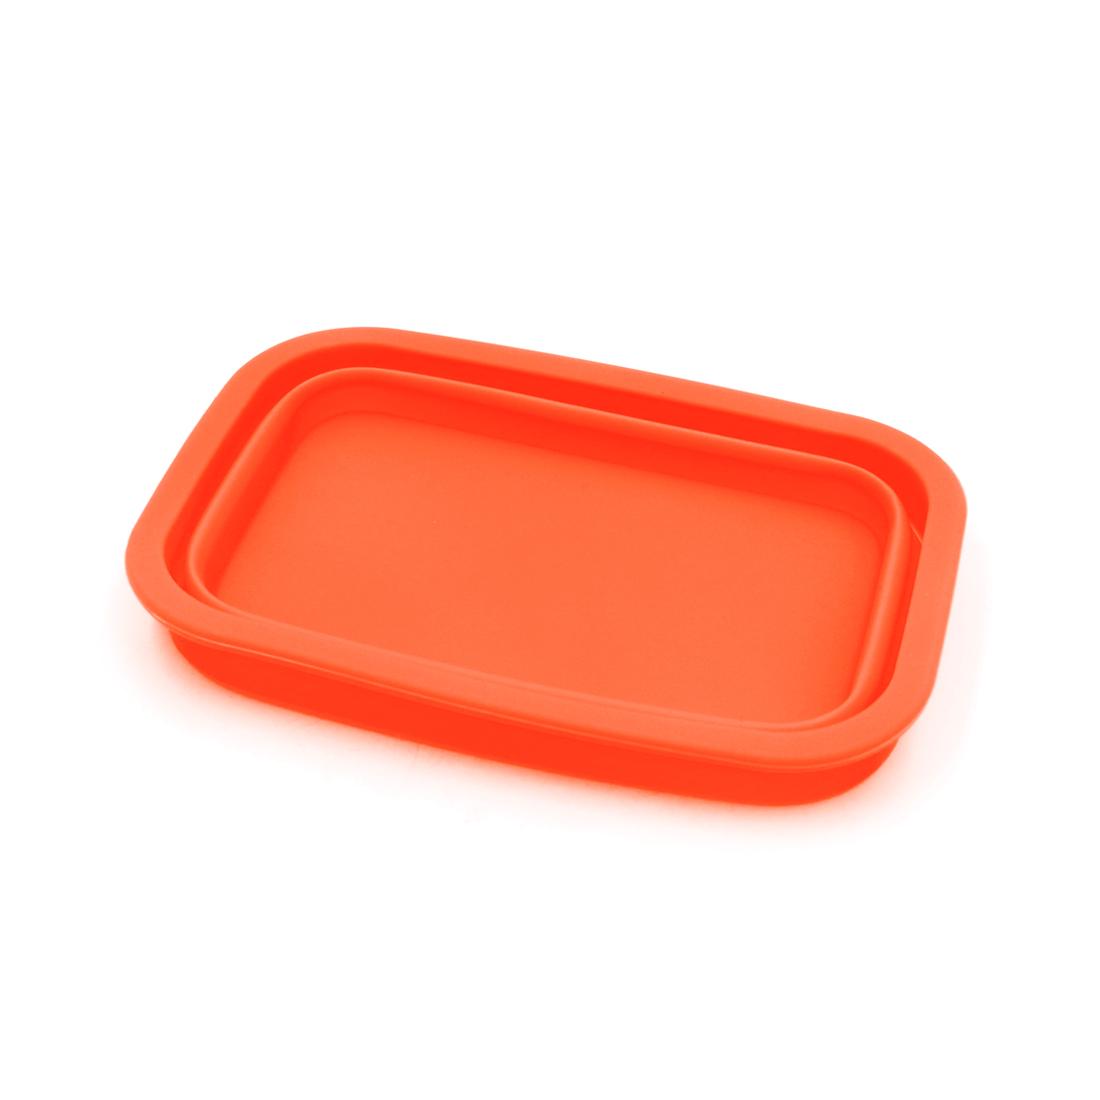 Orange Silicone Retangle Shaped Car Dashboard Non-Slip Phone Holder Storage Box